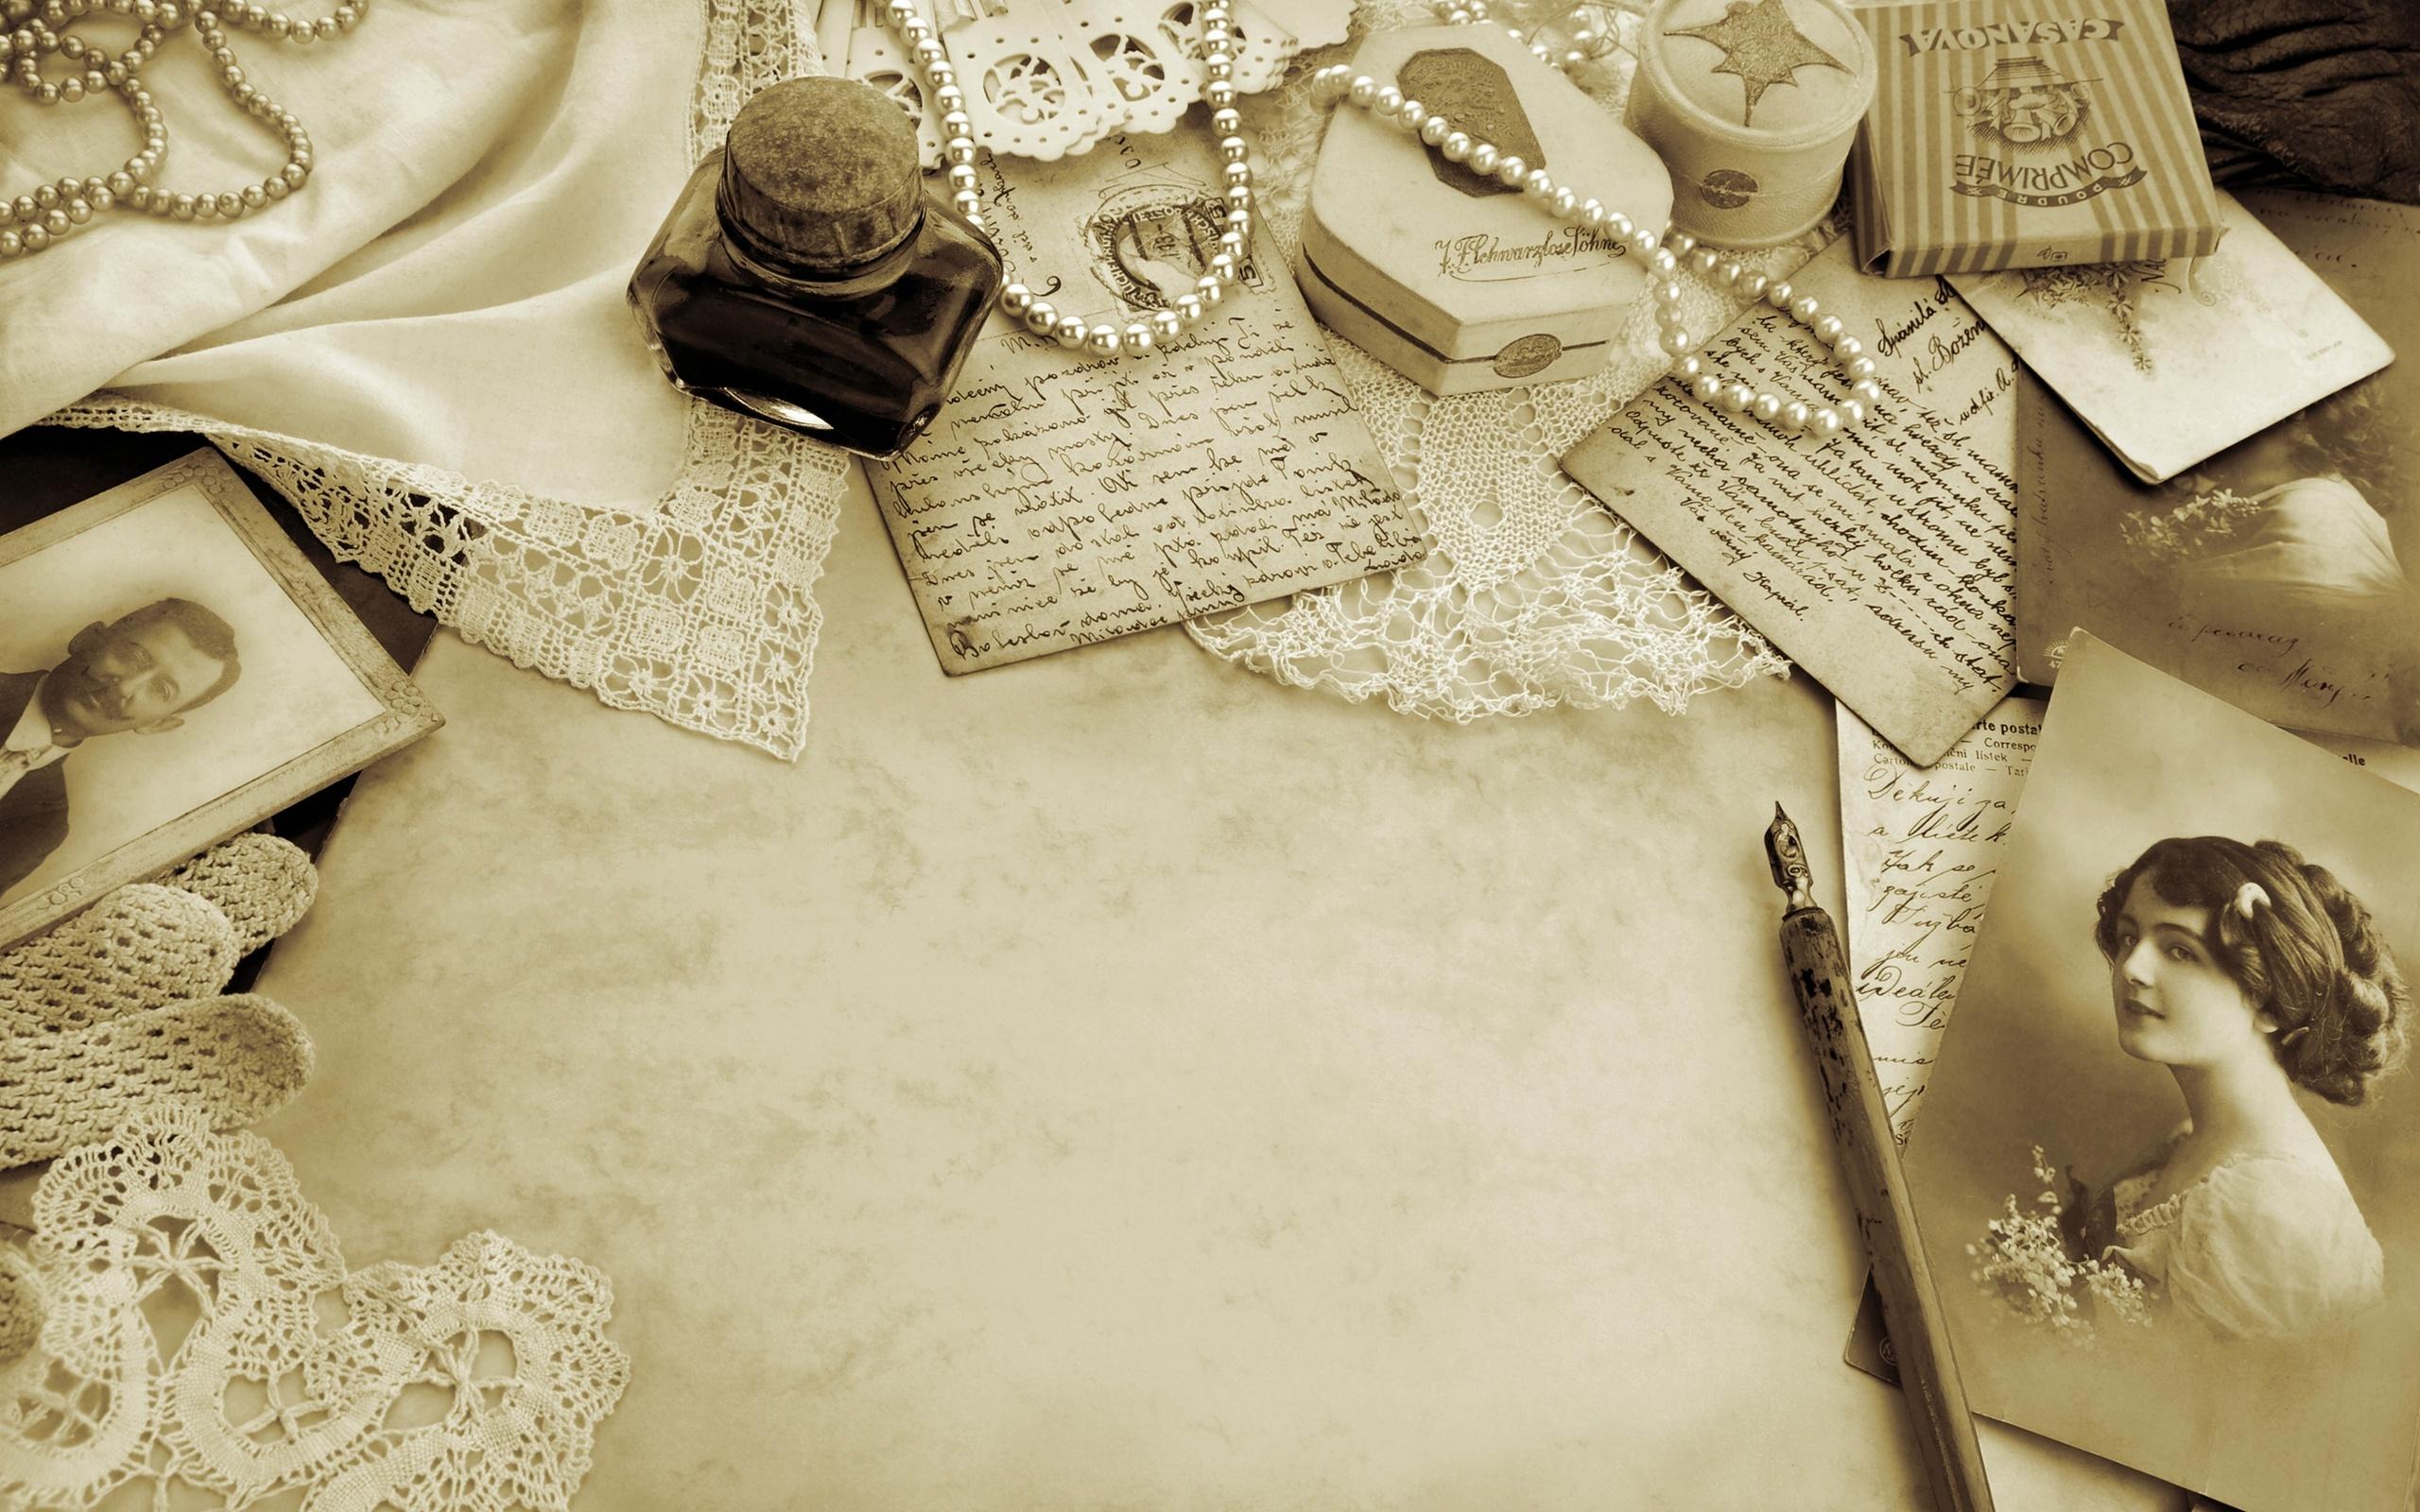 Photo letter pearls vintage style retro bokeh mood 2560x1600